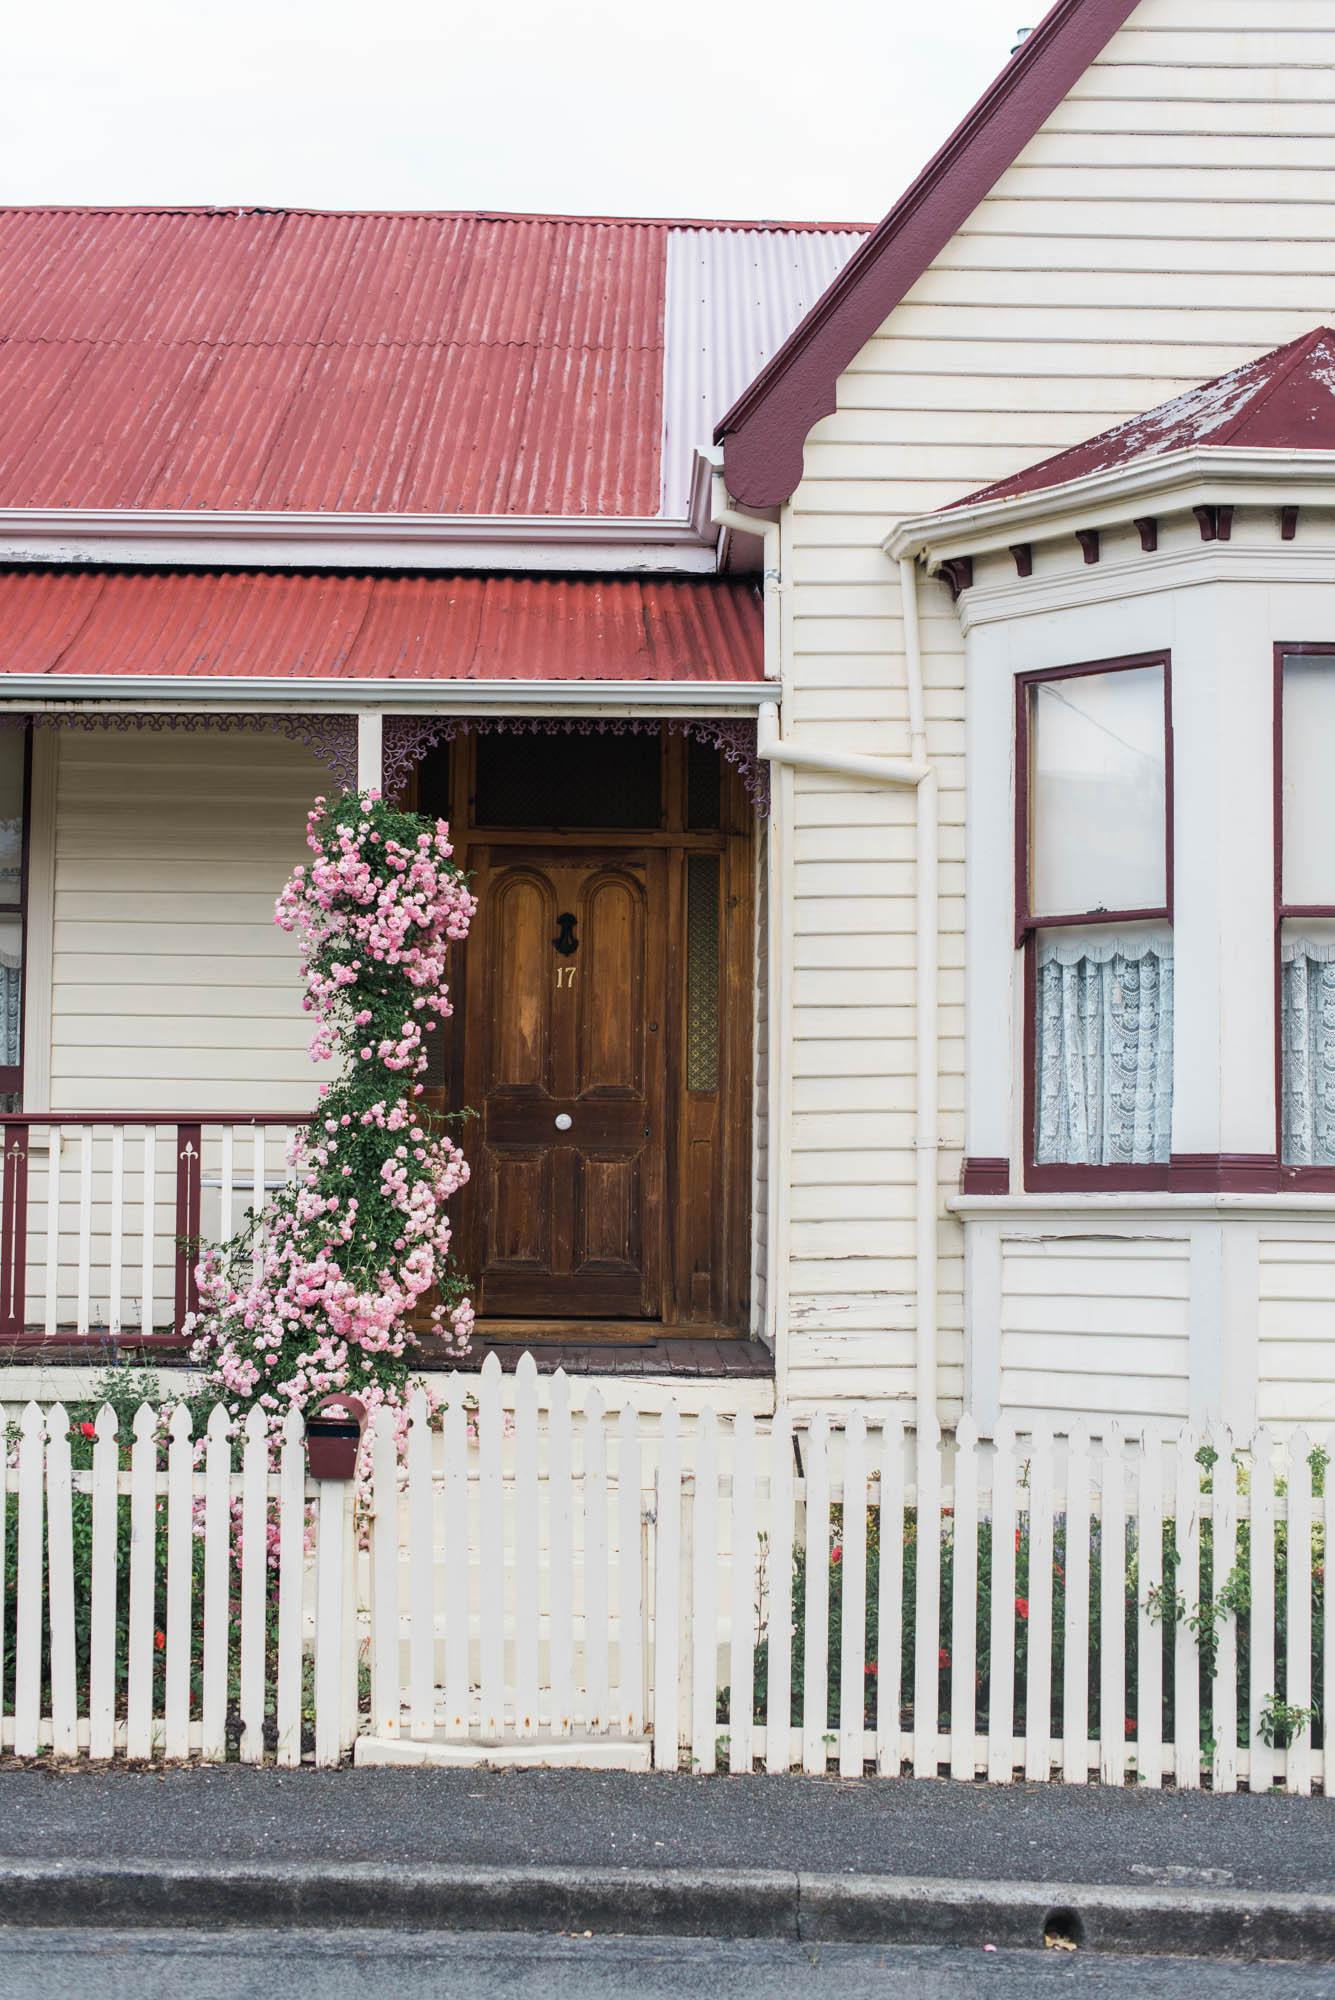 WEB-hannah puechmarin-tasmania photographer-7883.jpg